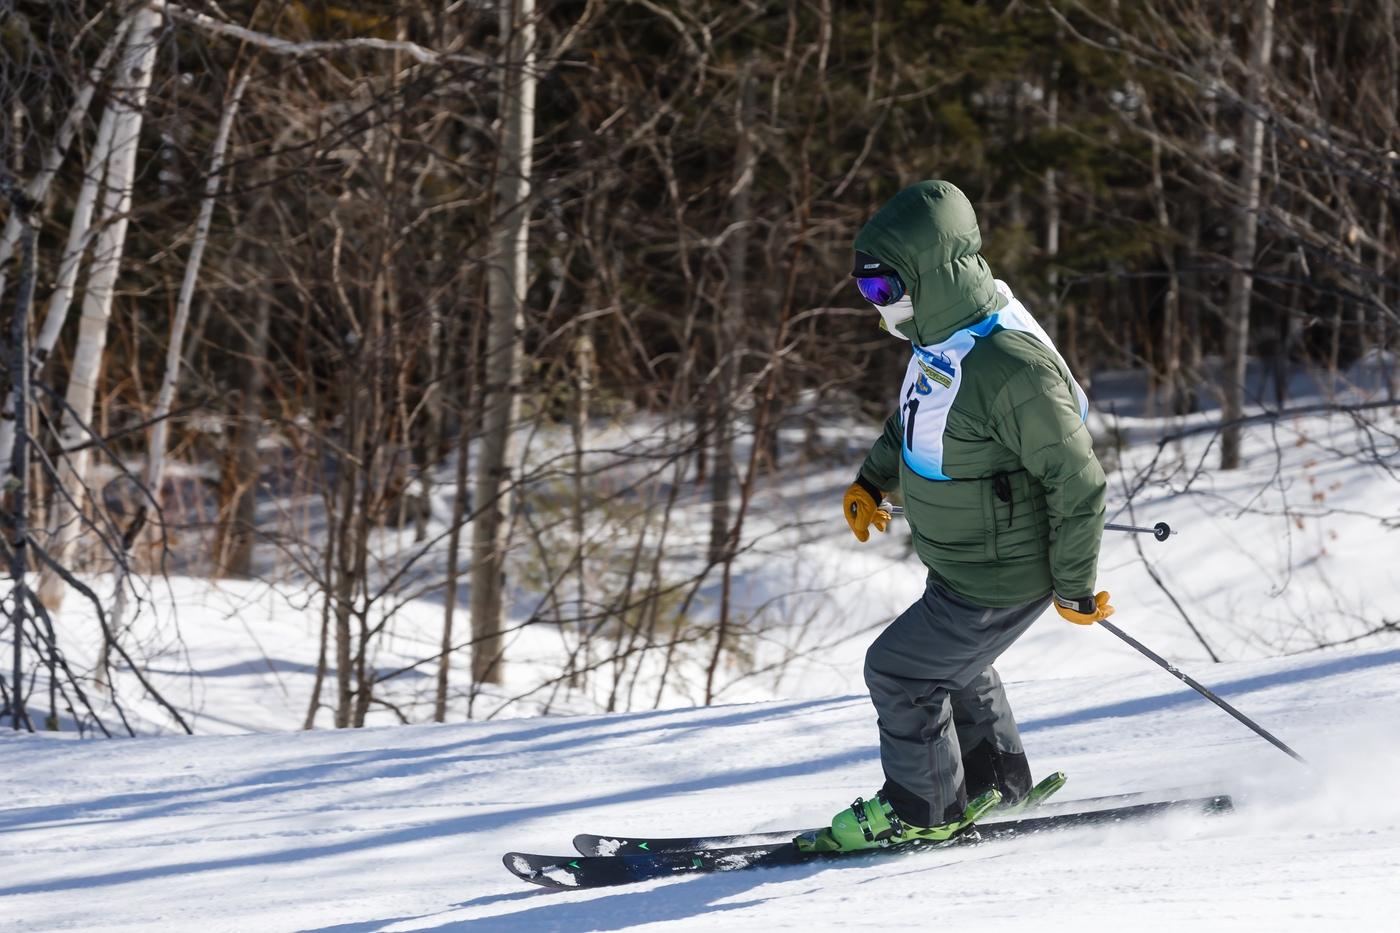 WinterKids Downhill 24 2021 SDP 3131